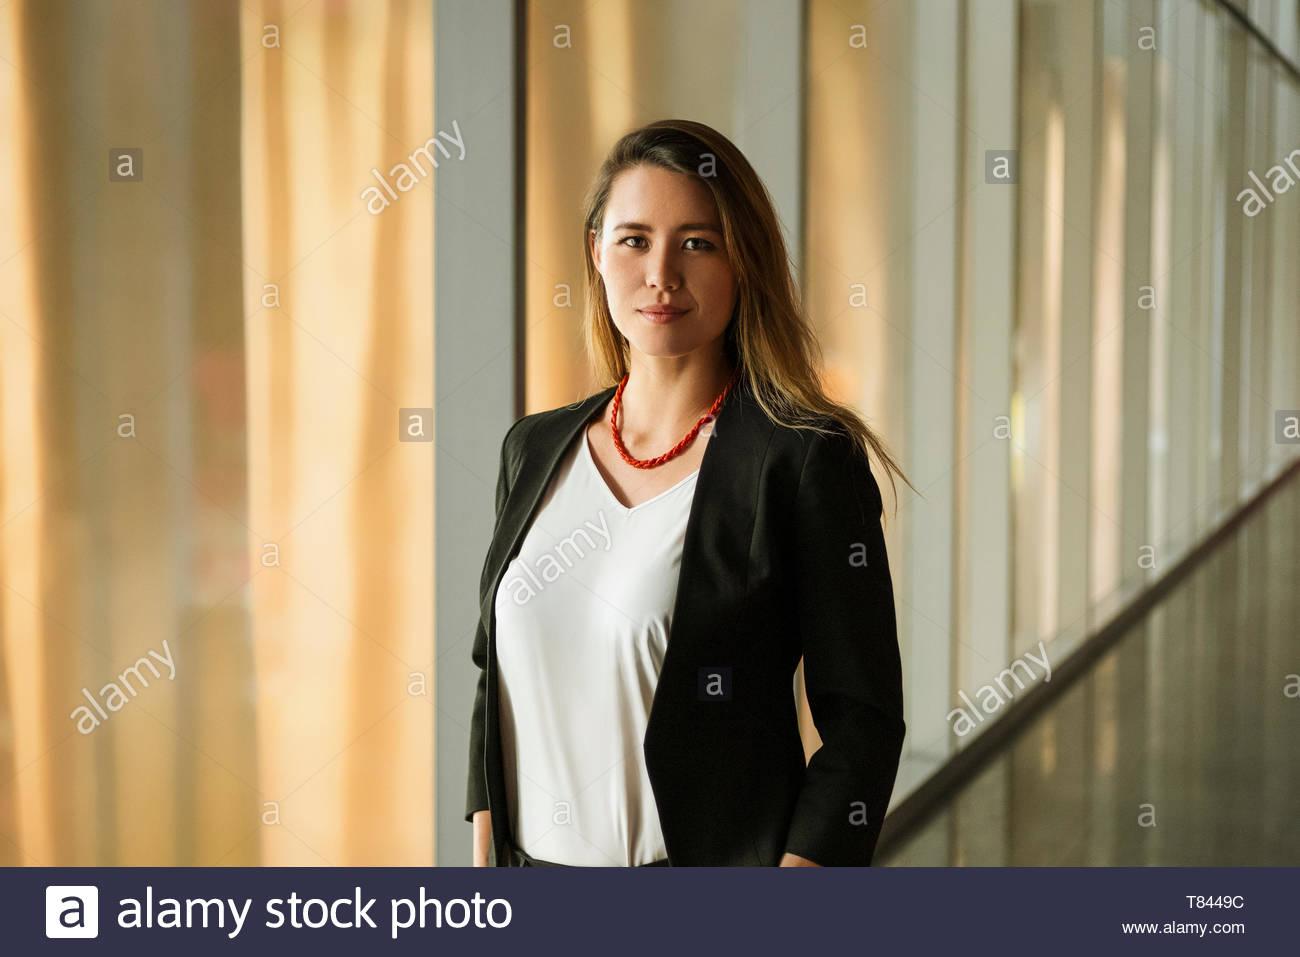 Young woman in corridor Stock Photo